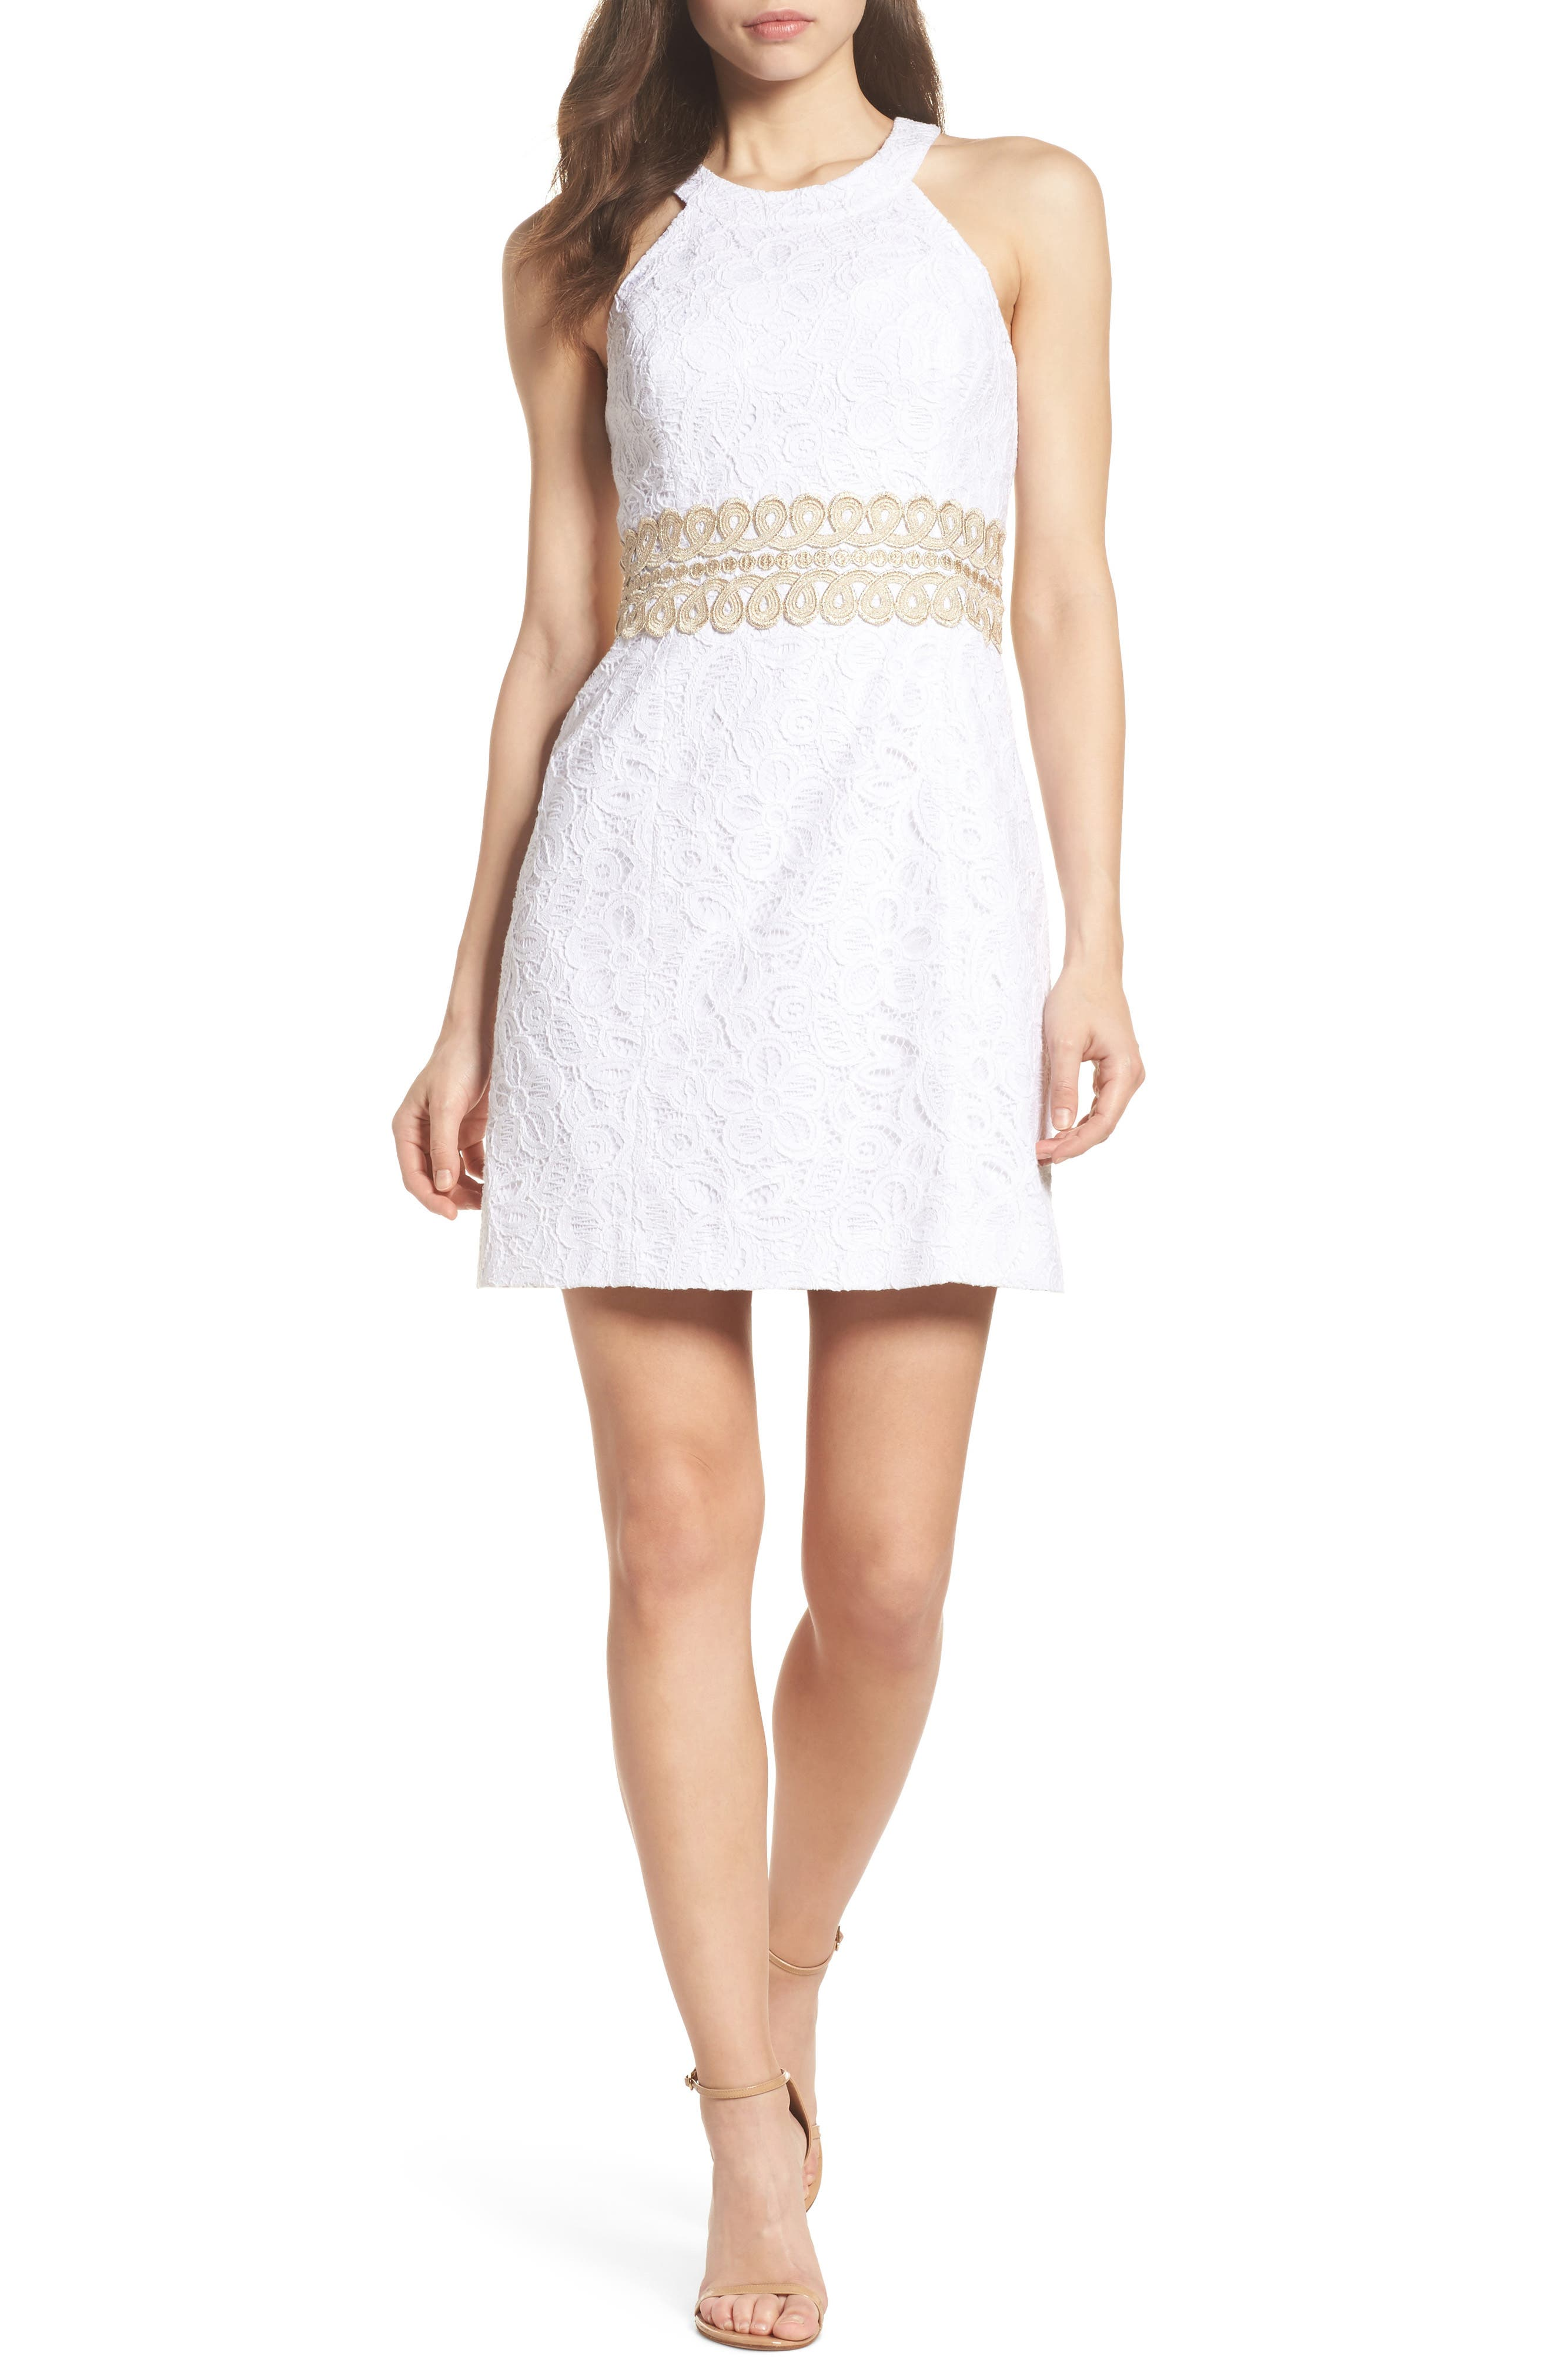 Ashlyn Lace Dress,                             Alternate thumbnail 5, color,                             RESORT WHITE POP FLORAL LACE